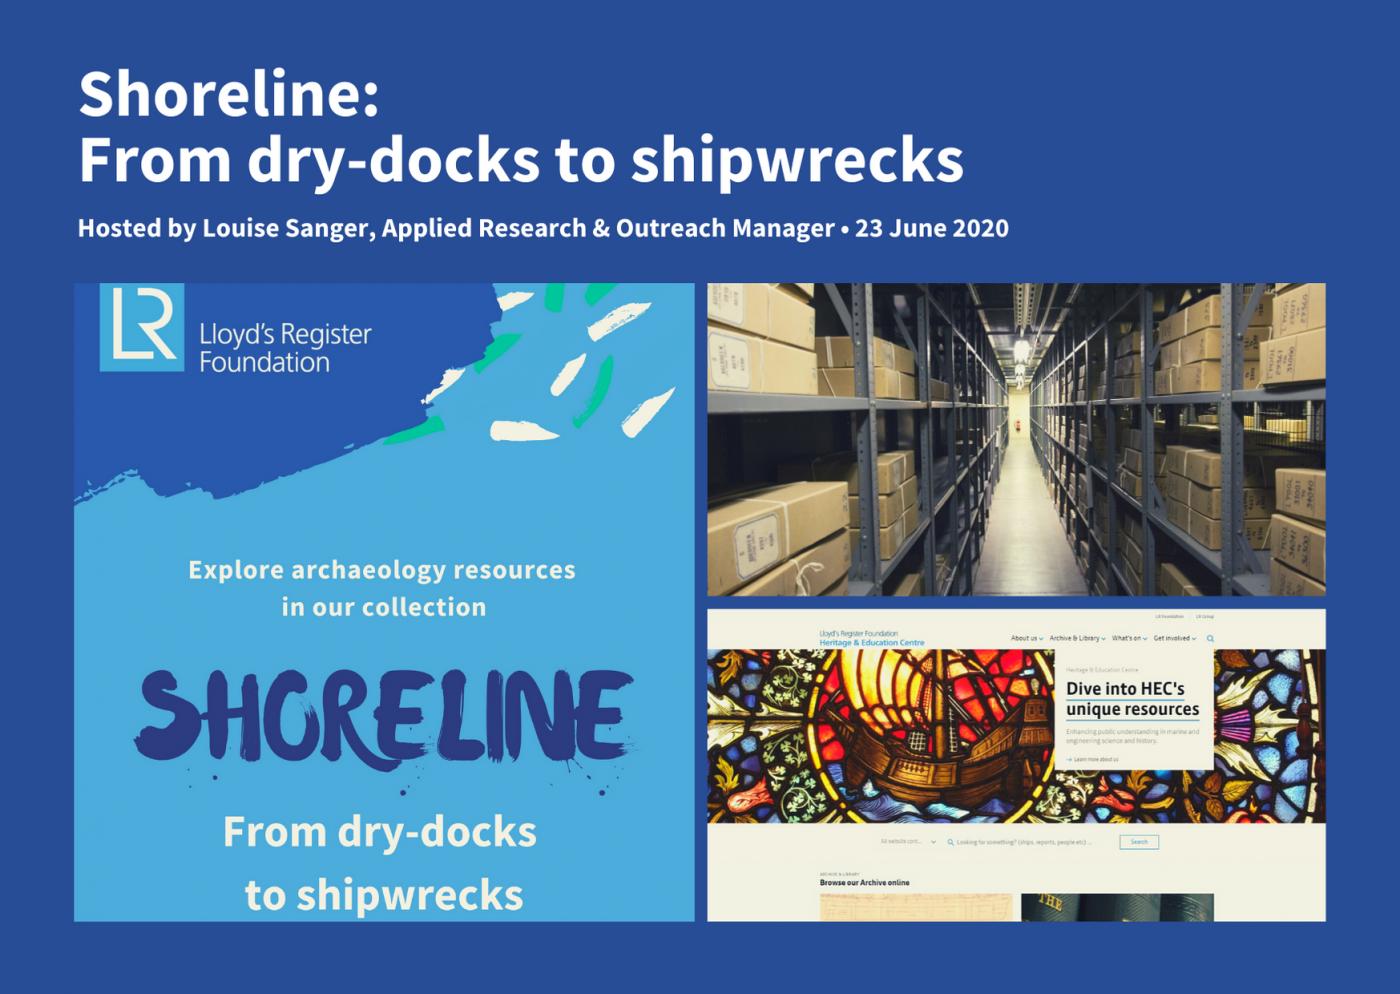 Shoreline webinar overview